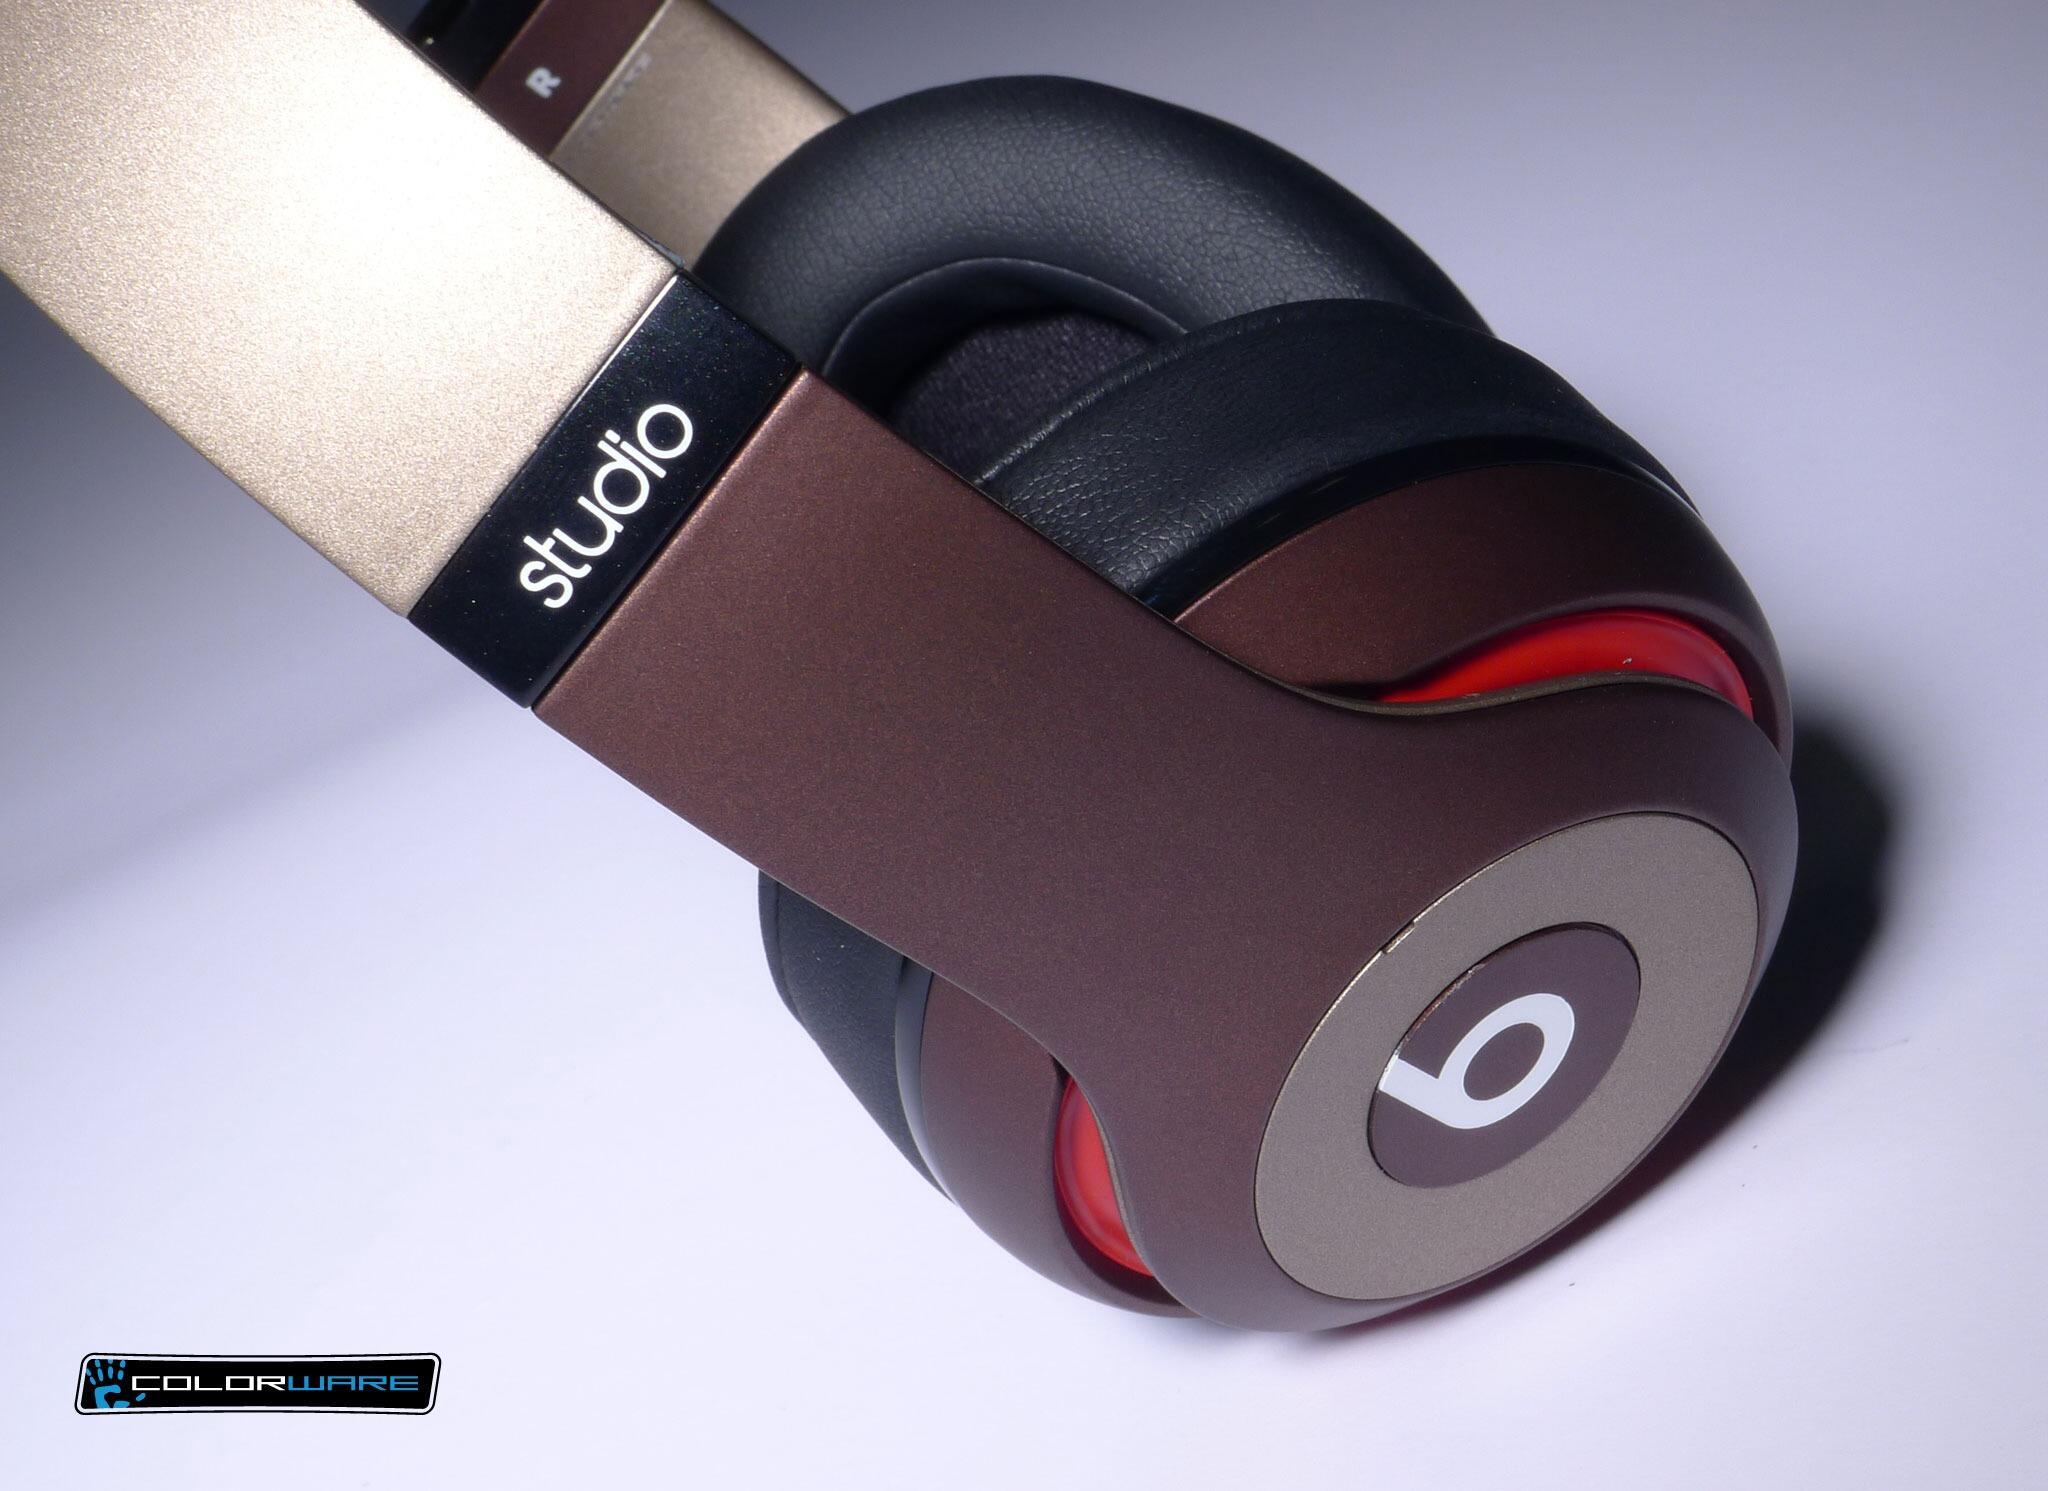 Great looking pair of Beats Studio headphones! #ColorWare #custom http://t.co/9S0MHfXsv7